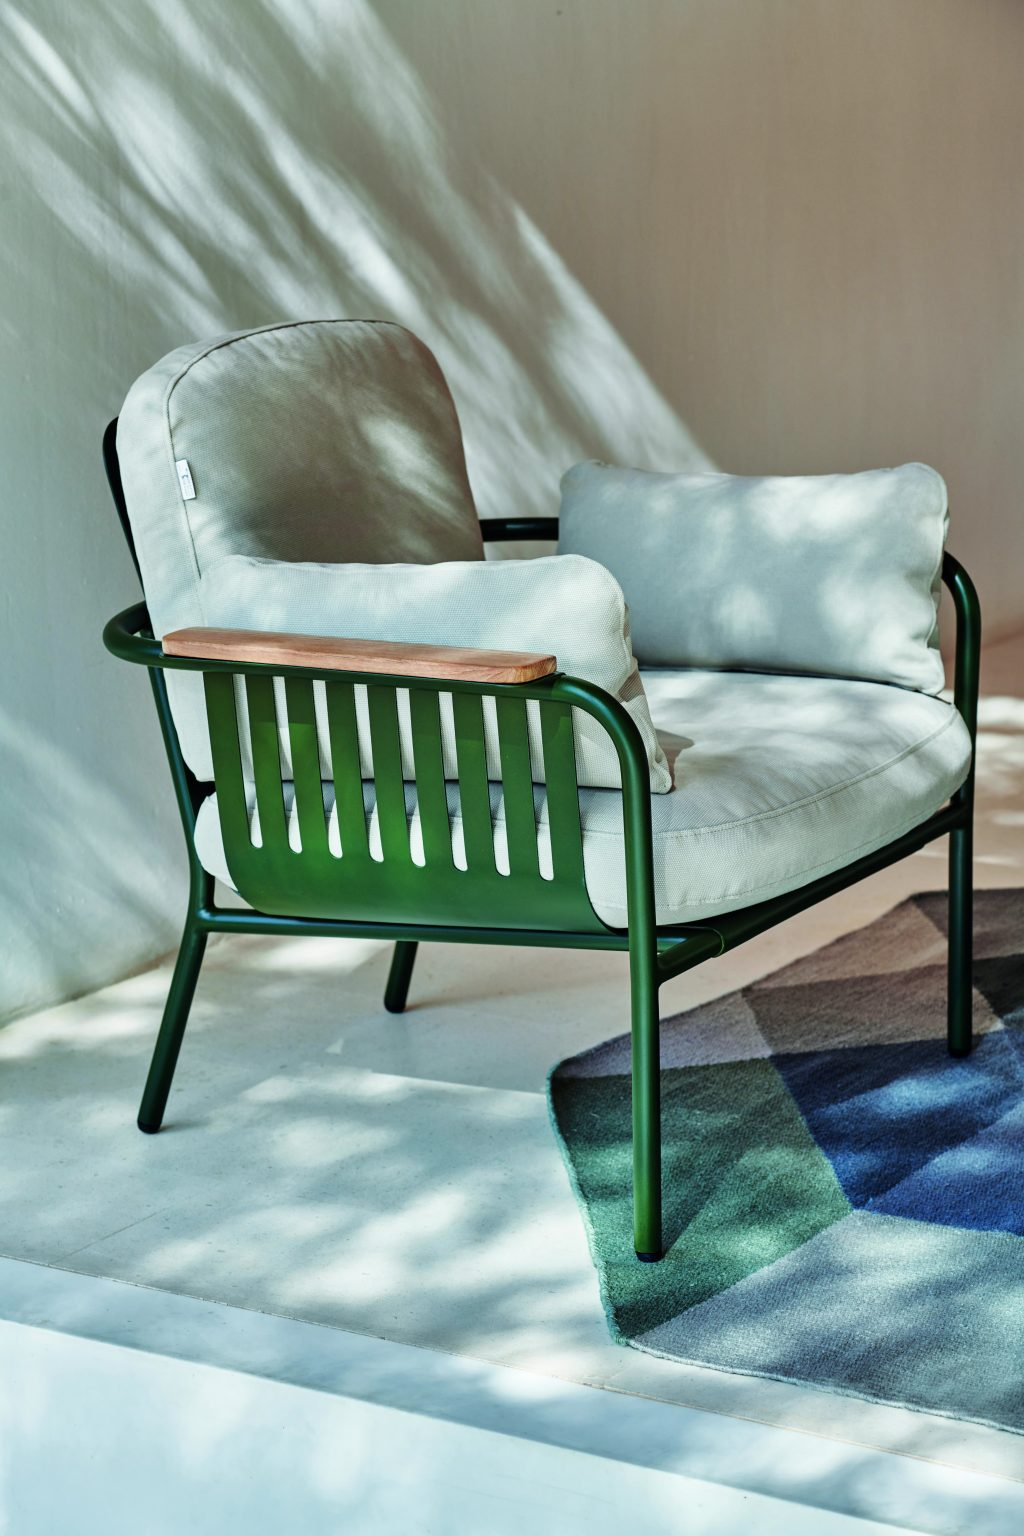 Biennale Interieur - Belgium's leading design and interior event - Capa-composition-lounge-chair-bottle-green-patio-detail-01.jpg